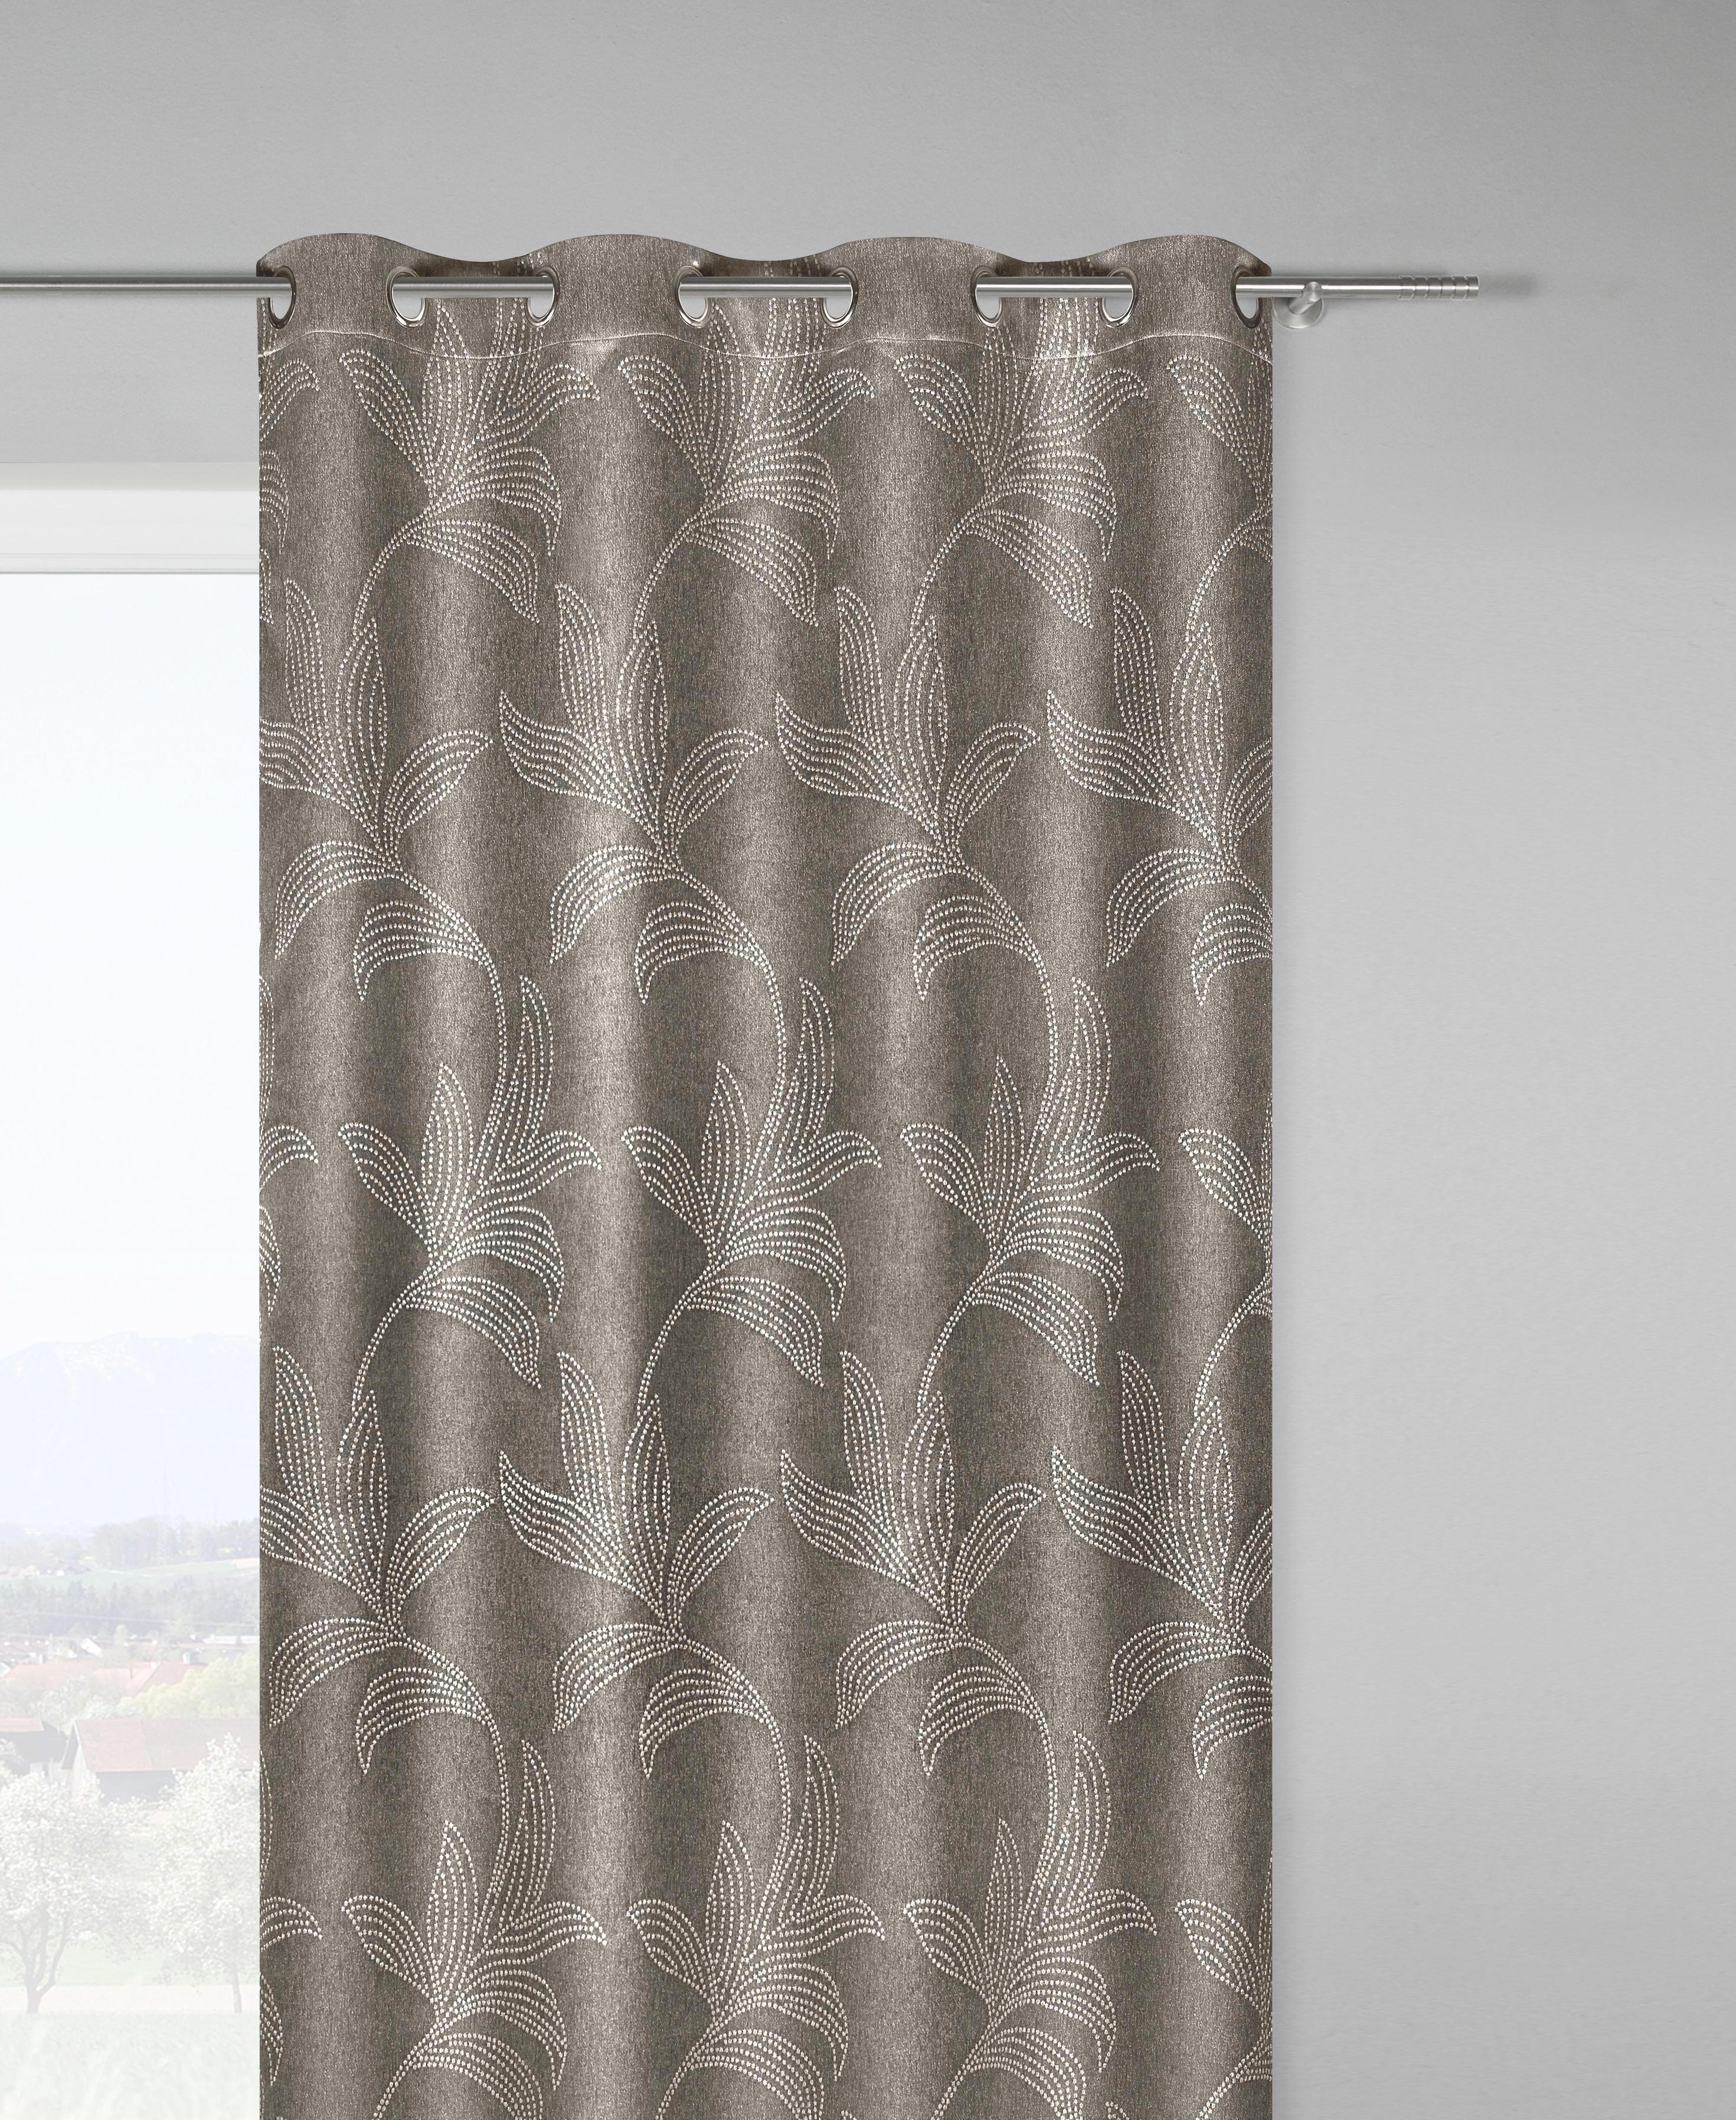 Ösenschal Linda in Braun, ca. 140x245cm - Braun, KONVENTIONELL, Textil (140/245cm) - MÖMAX modern living